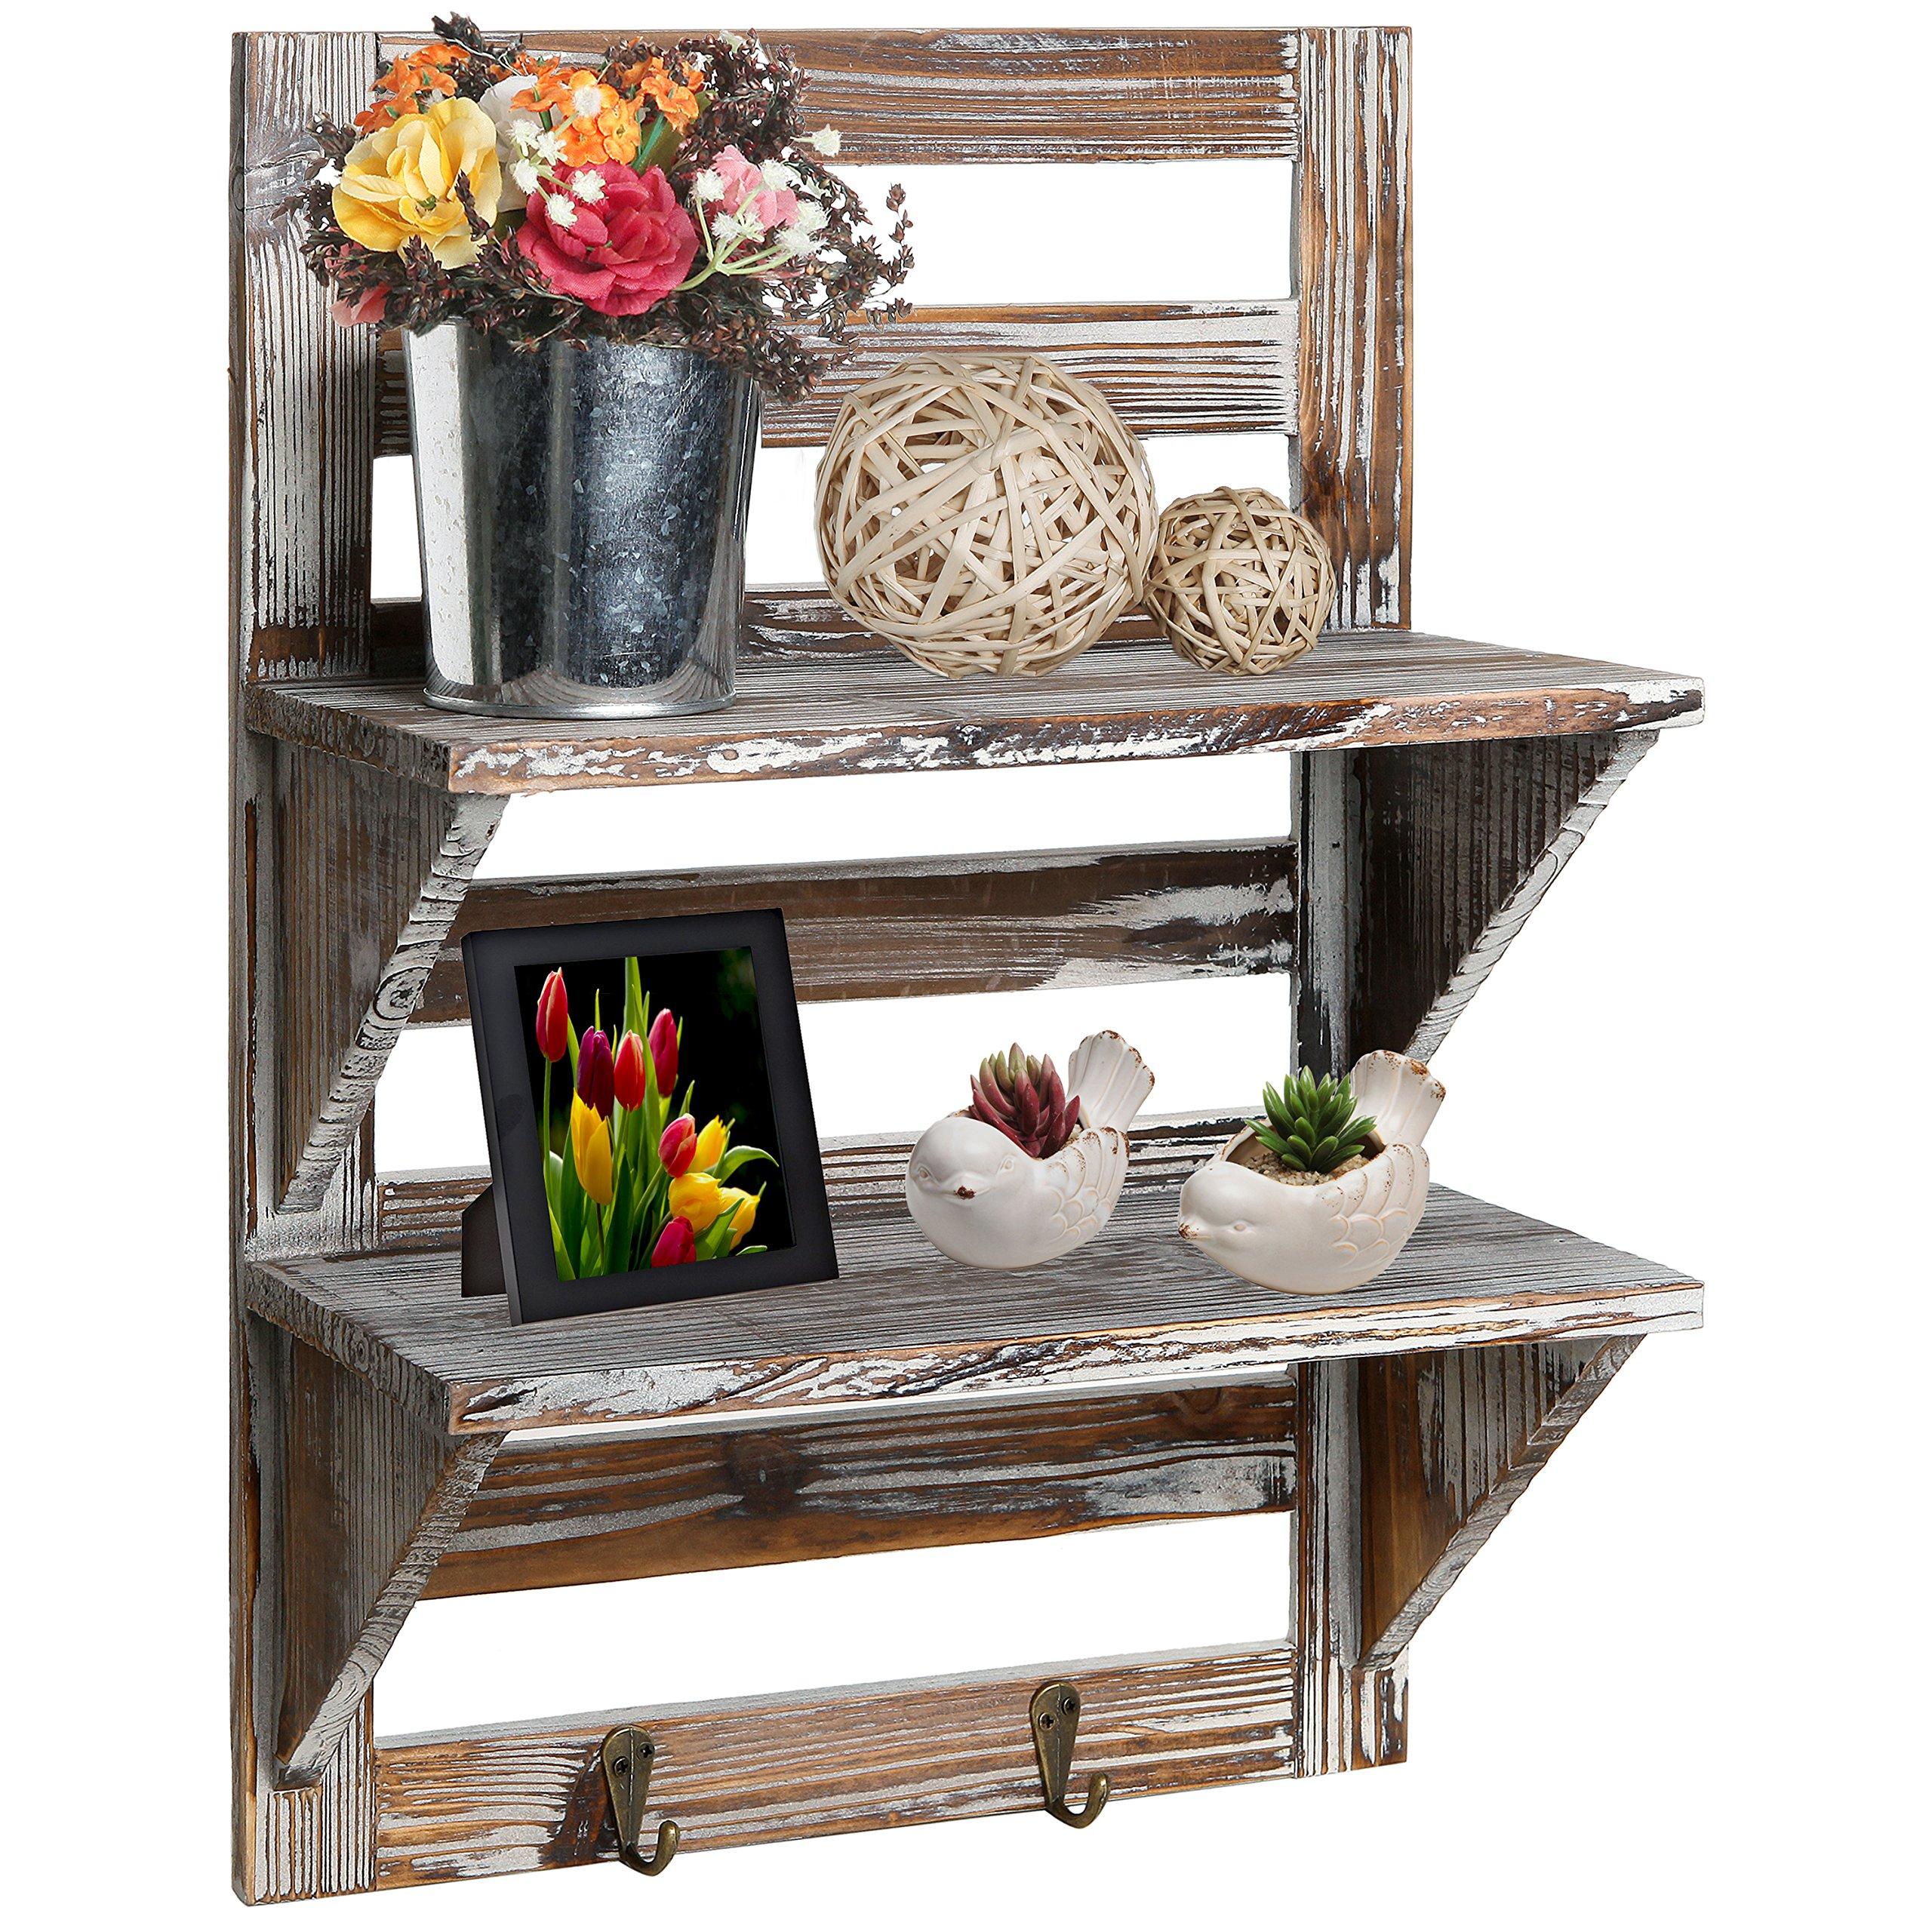 MyGift Rustic Wood Wall Mounted Organizer Shelves w/ 2 Hooks, 2-Tier Storage Rack, Brown